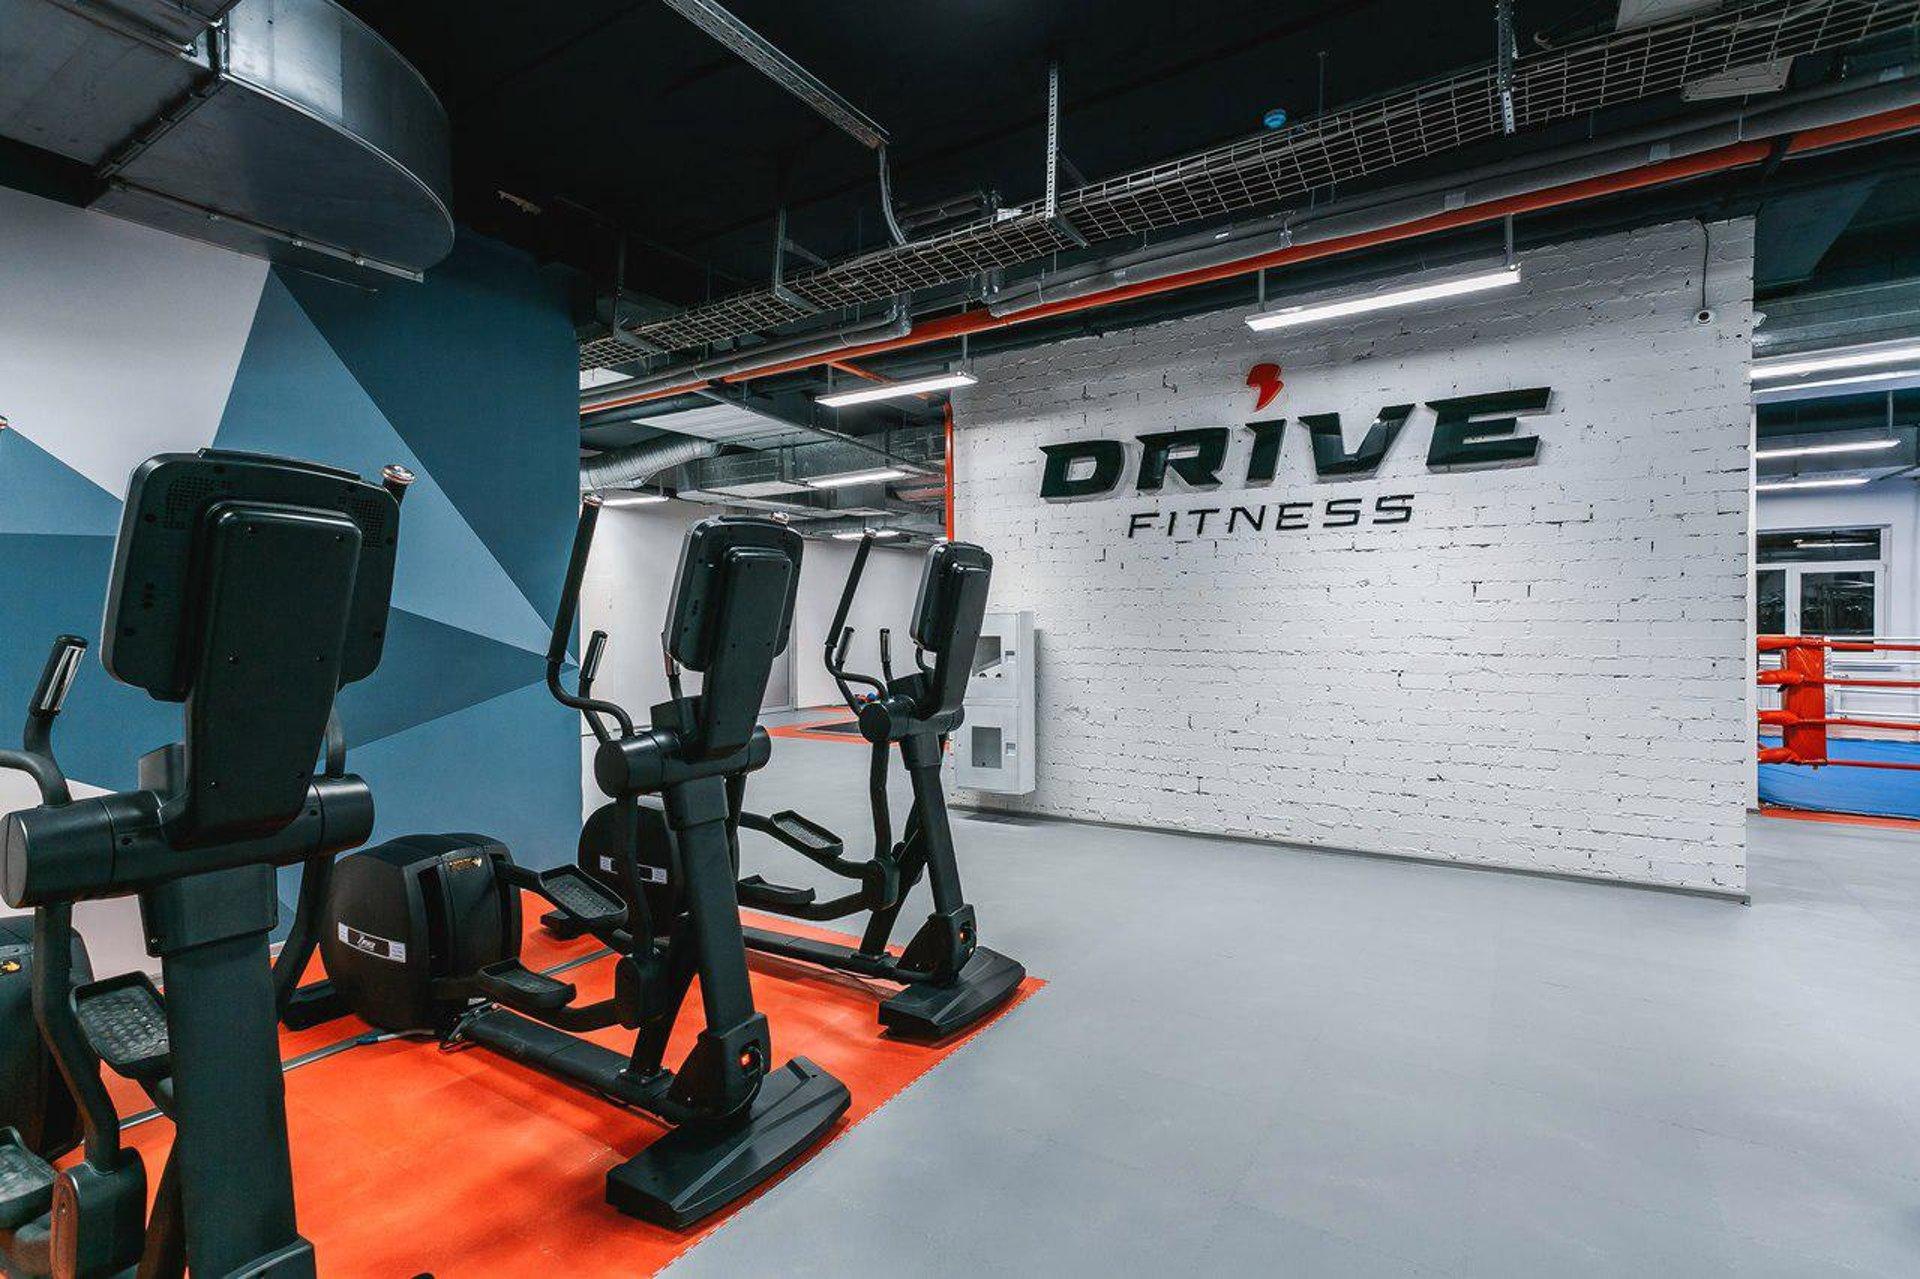 Экскурсия в фитнес-клуб Drive Fitness